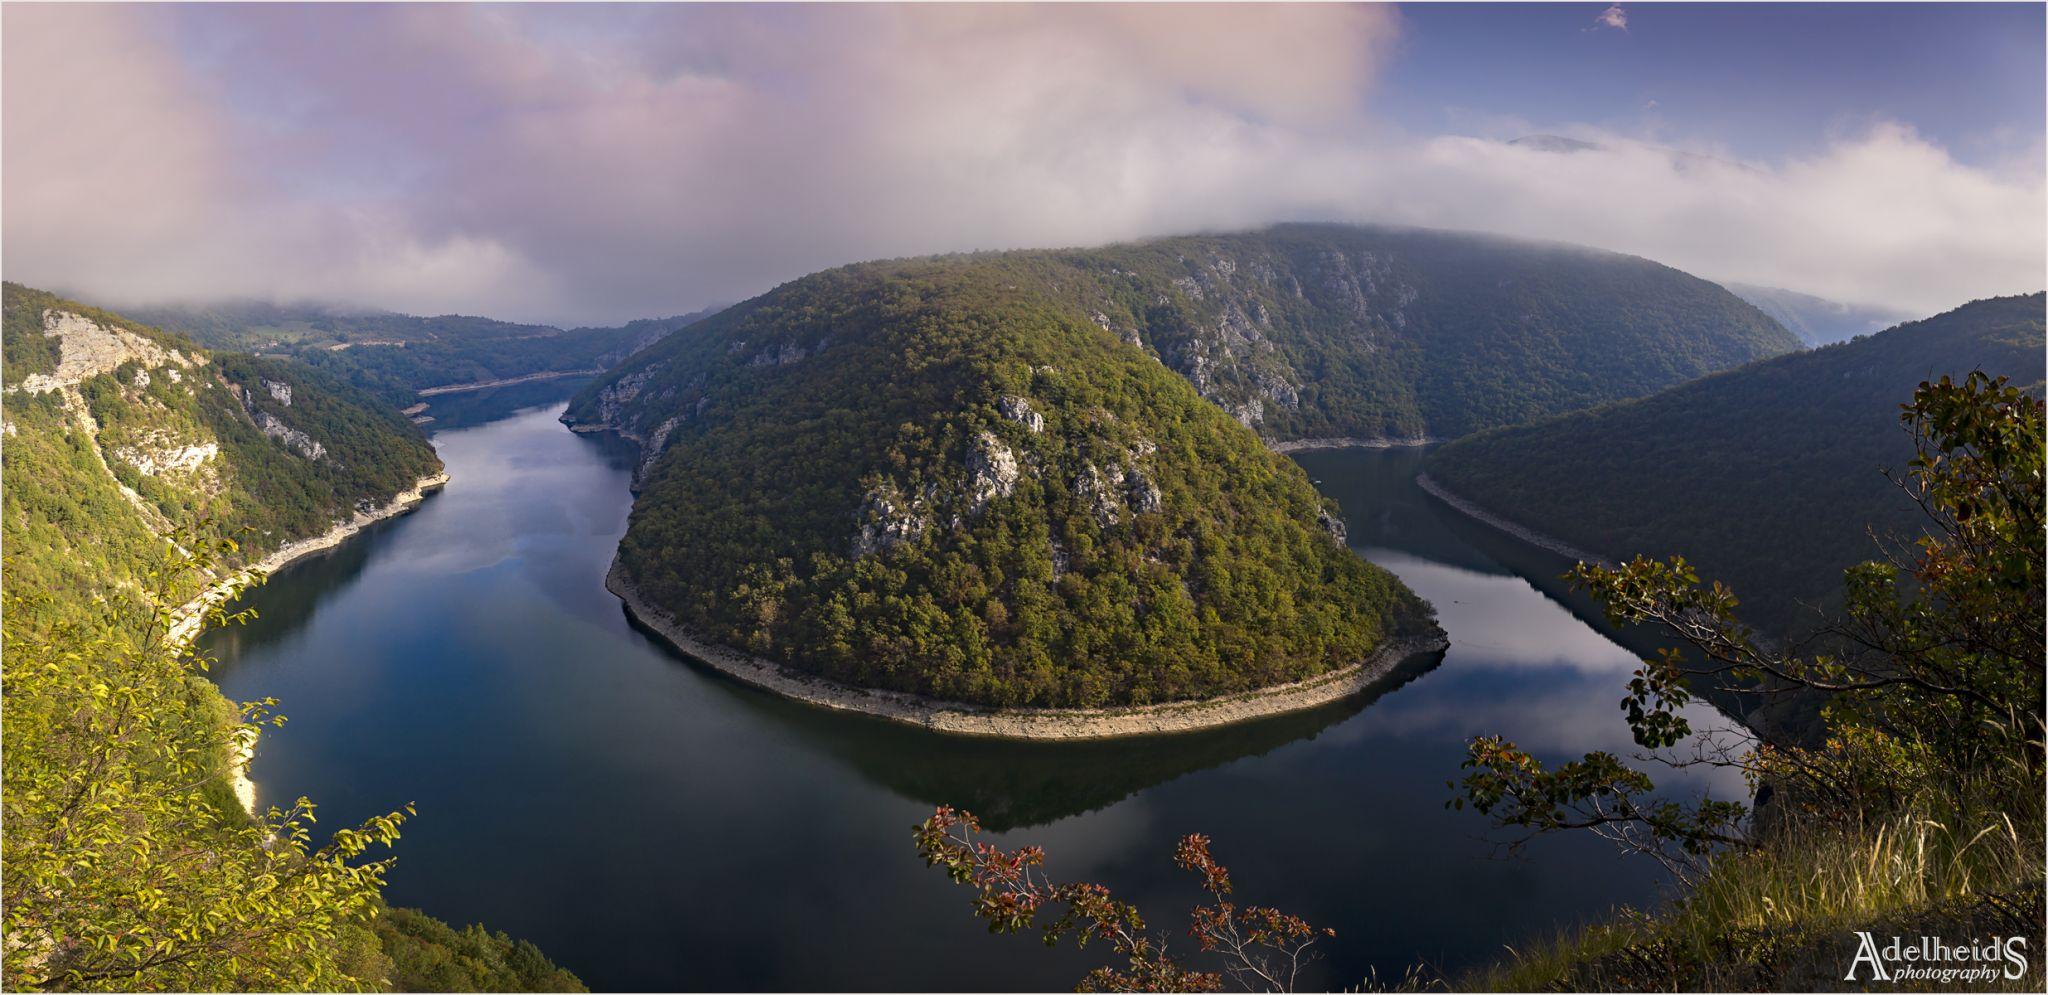 Vrbas River Bend, Bosnia and Herzegovina